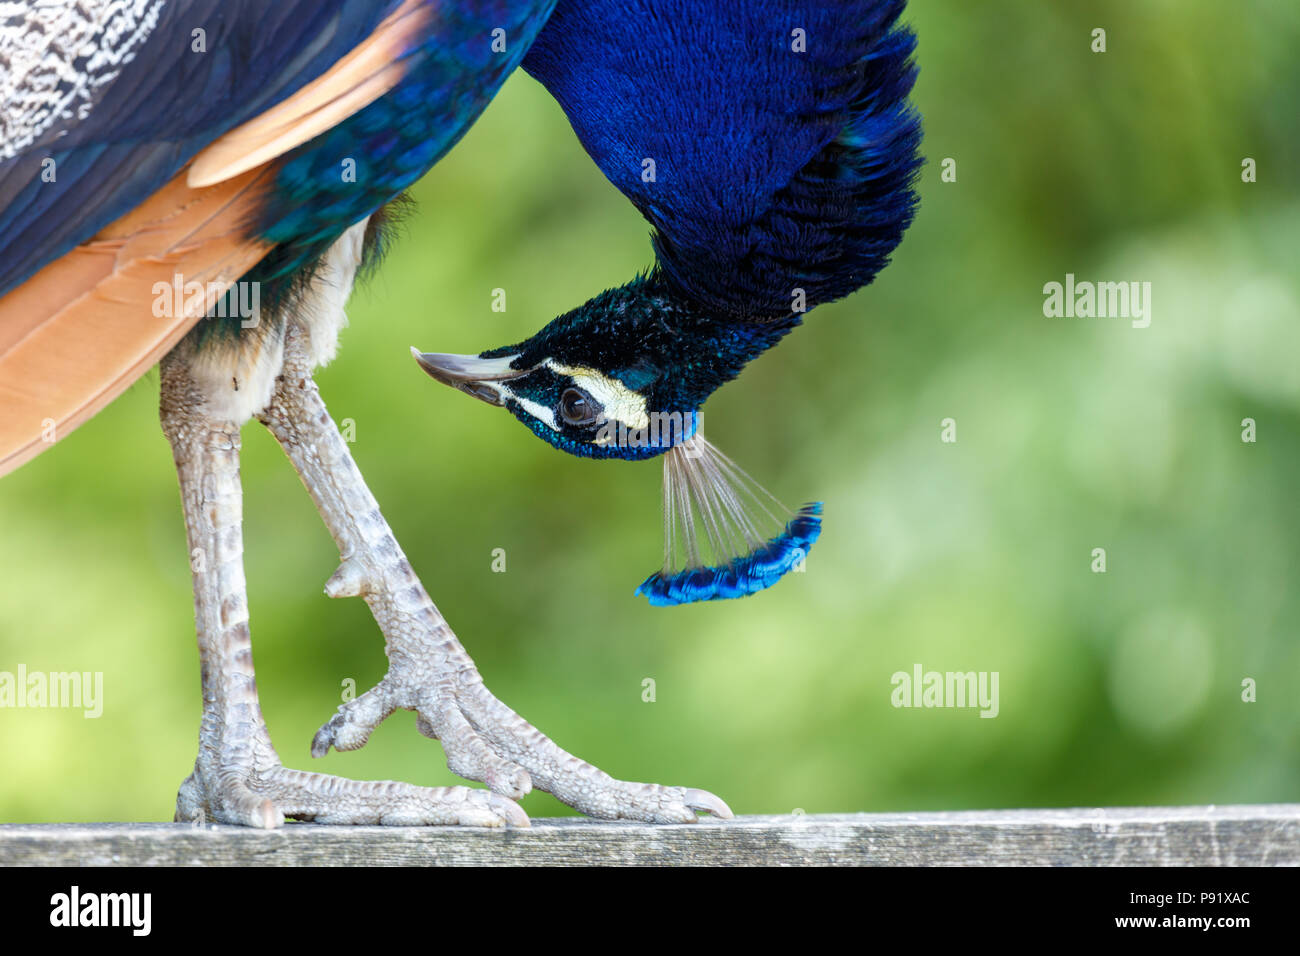 wild Peacock bird at Surrey BC Canada - Stock Image